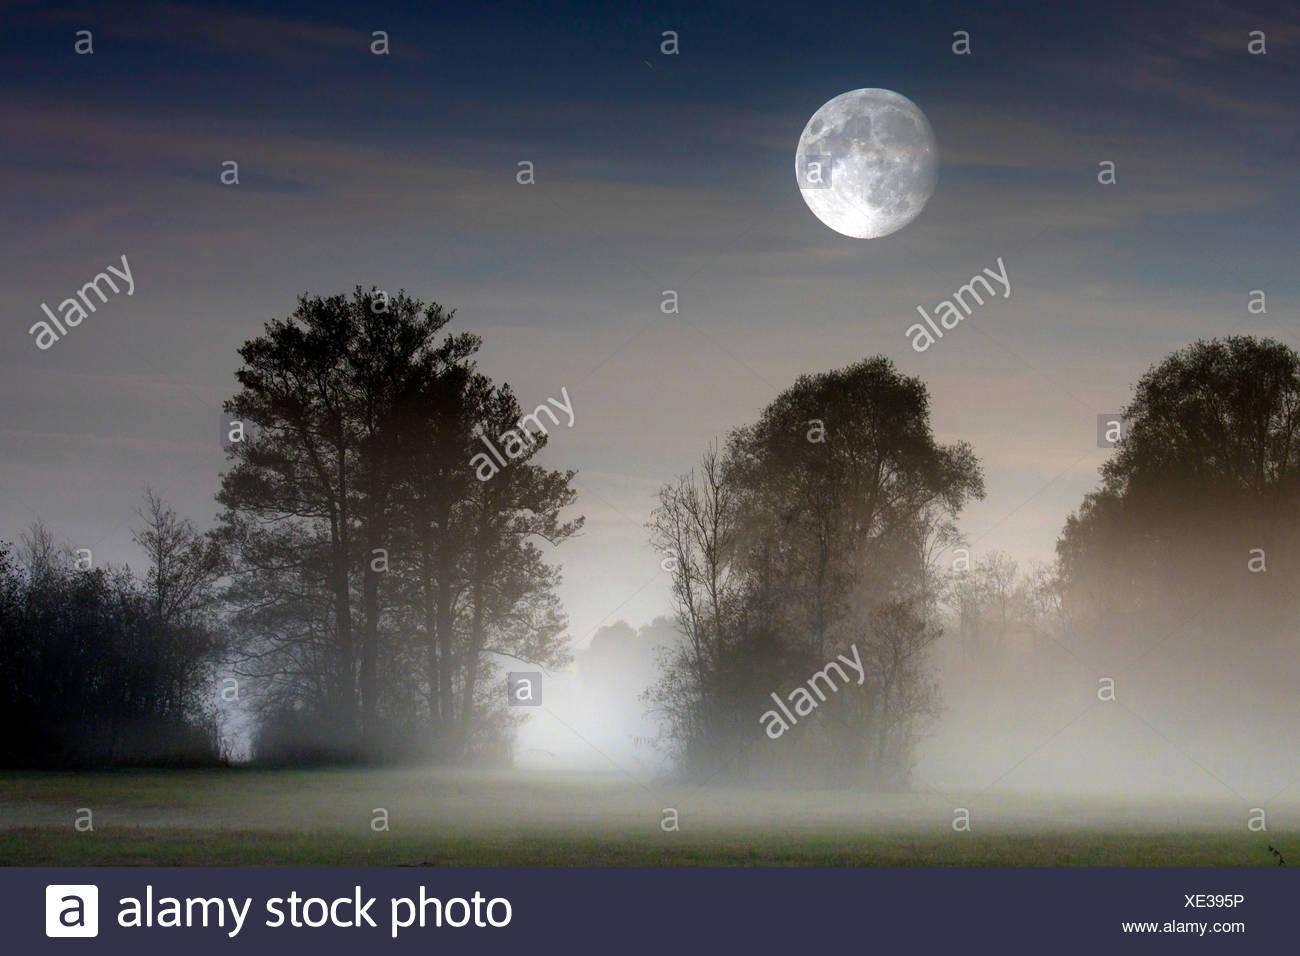 Vollmond ueber im Moor aufsteigendem Bodennebel, Deutschland, Bayern, Grabenstaetter Moor | full moon over ascending mist on moo Stock Photo